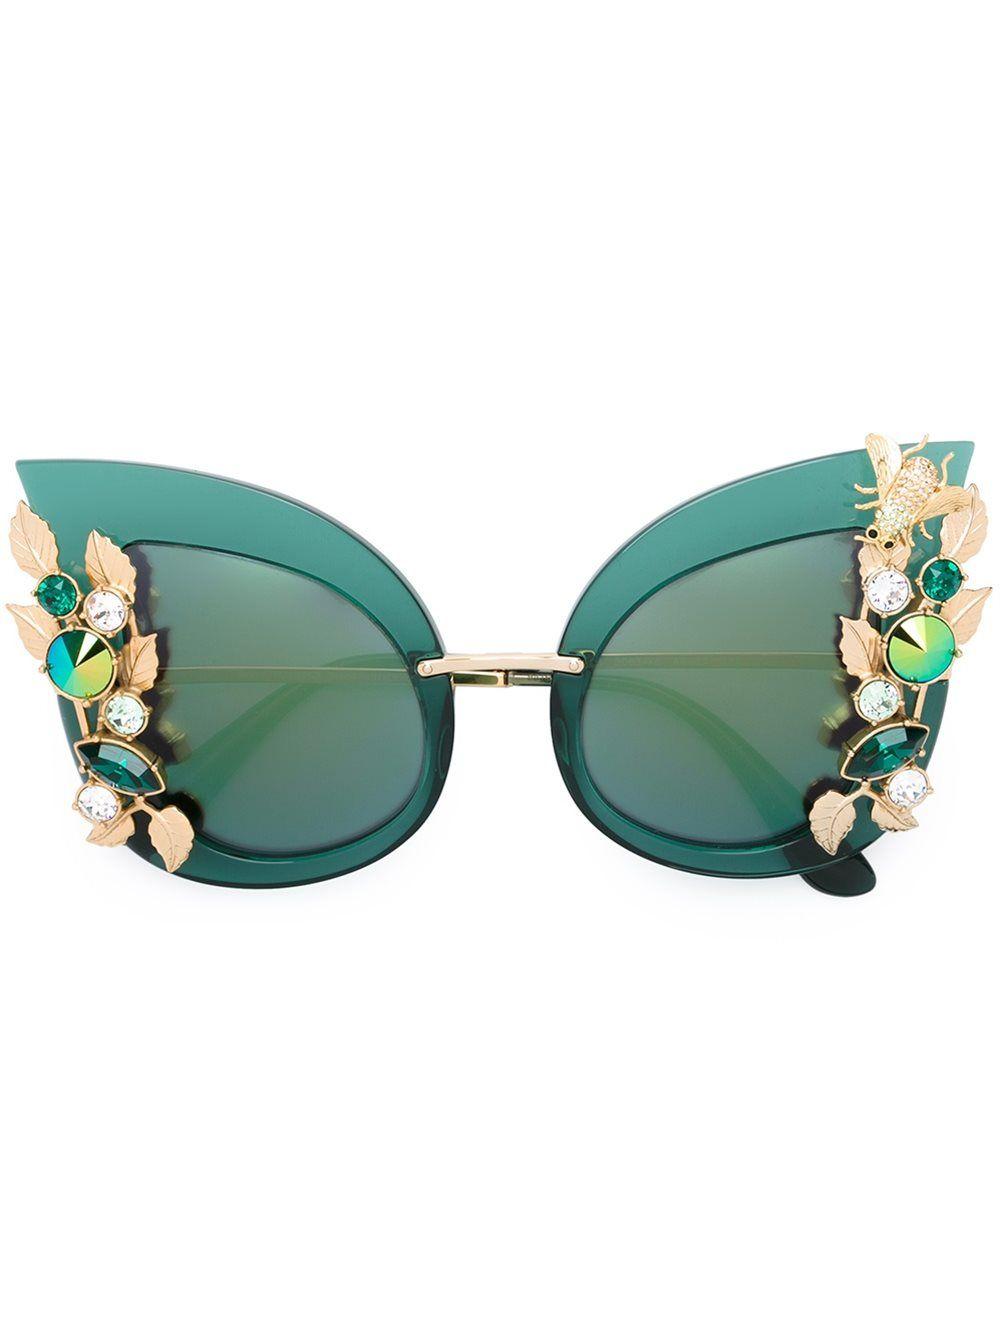 deb164a3df98 Dolce  amp  Gabbana embellished sunglasses Dolce Gabbana Lunettes